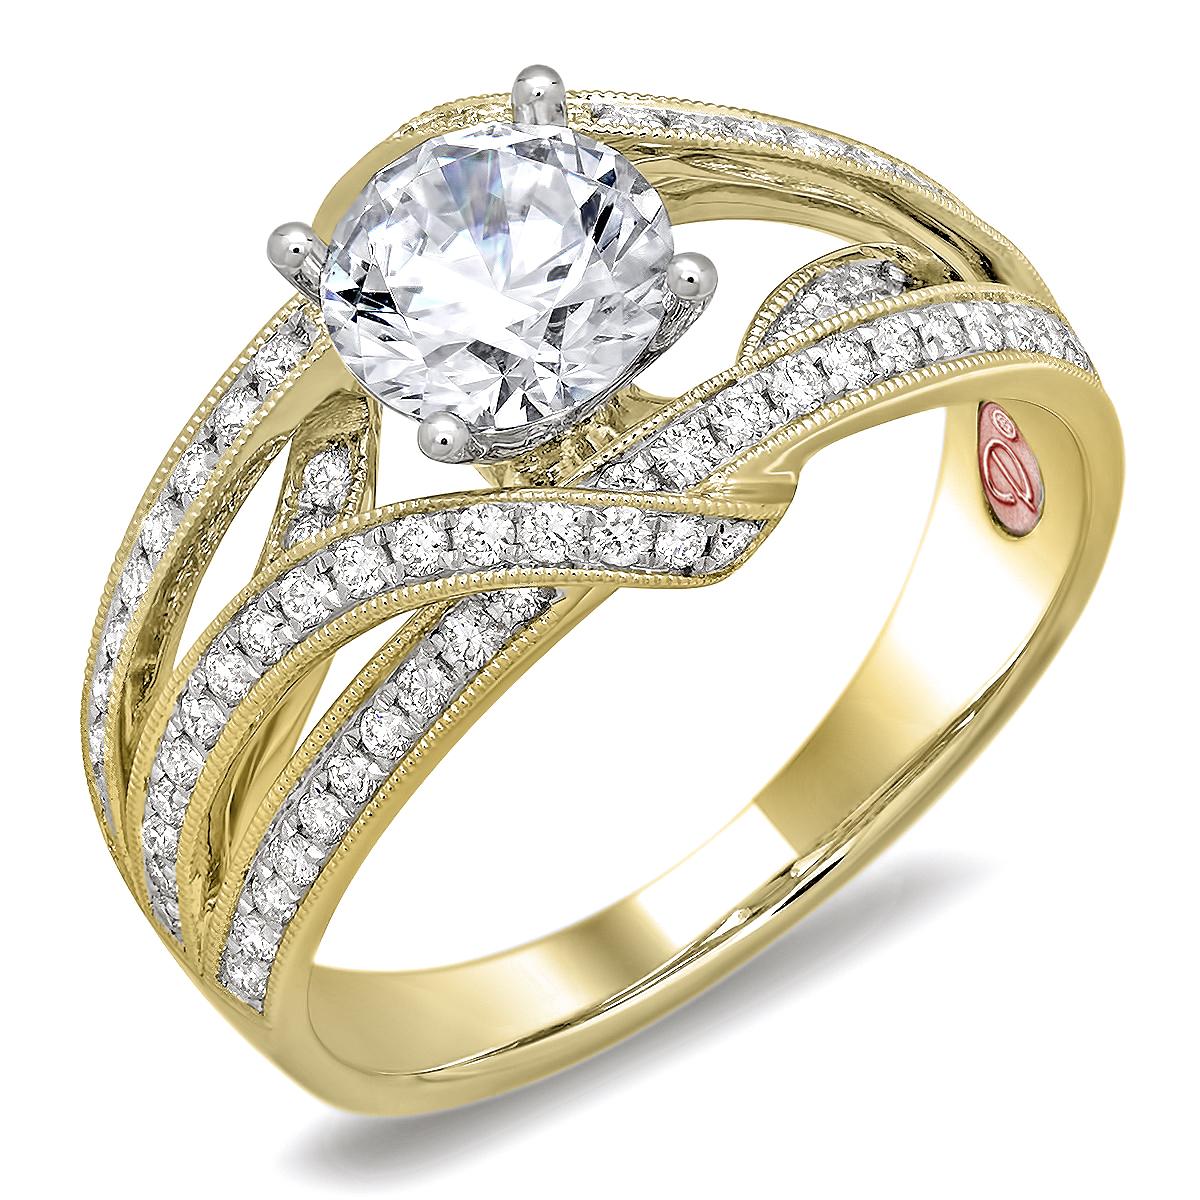 Designer Bridal Rings - DW6078